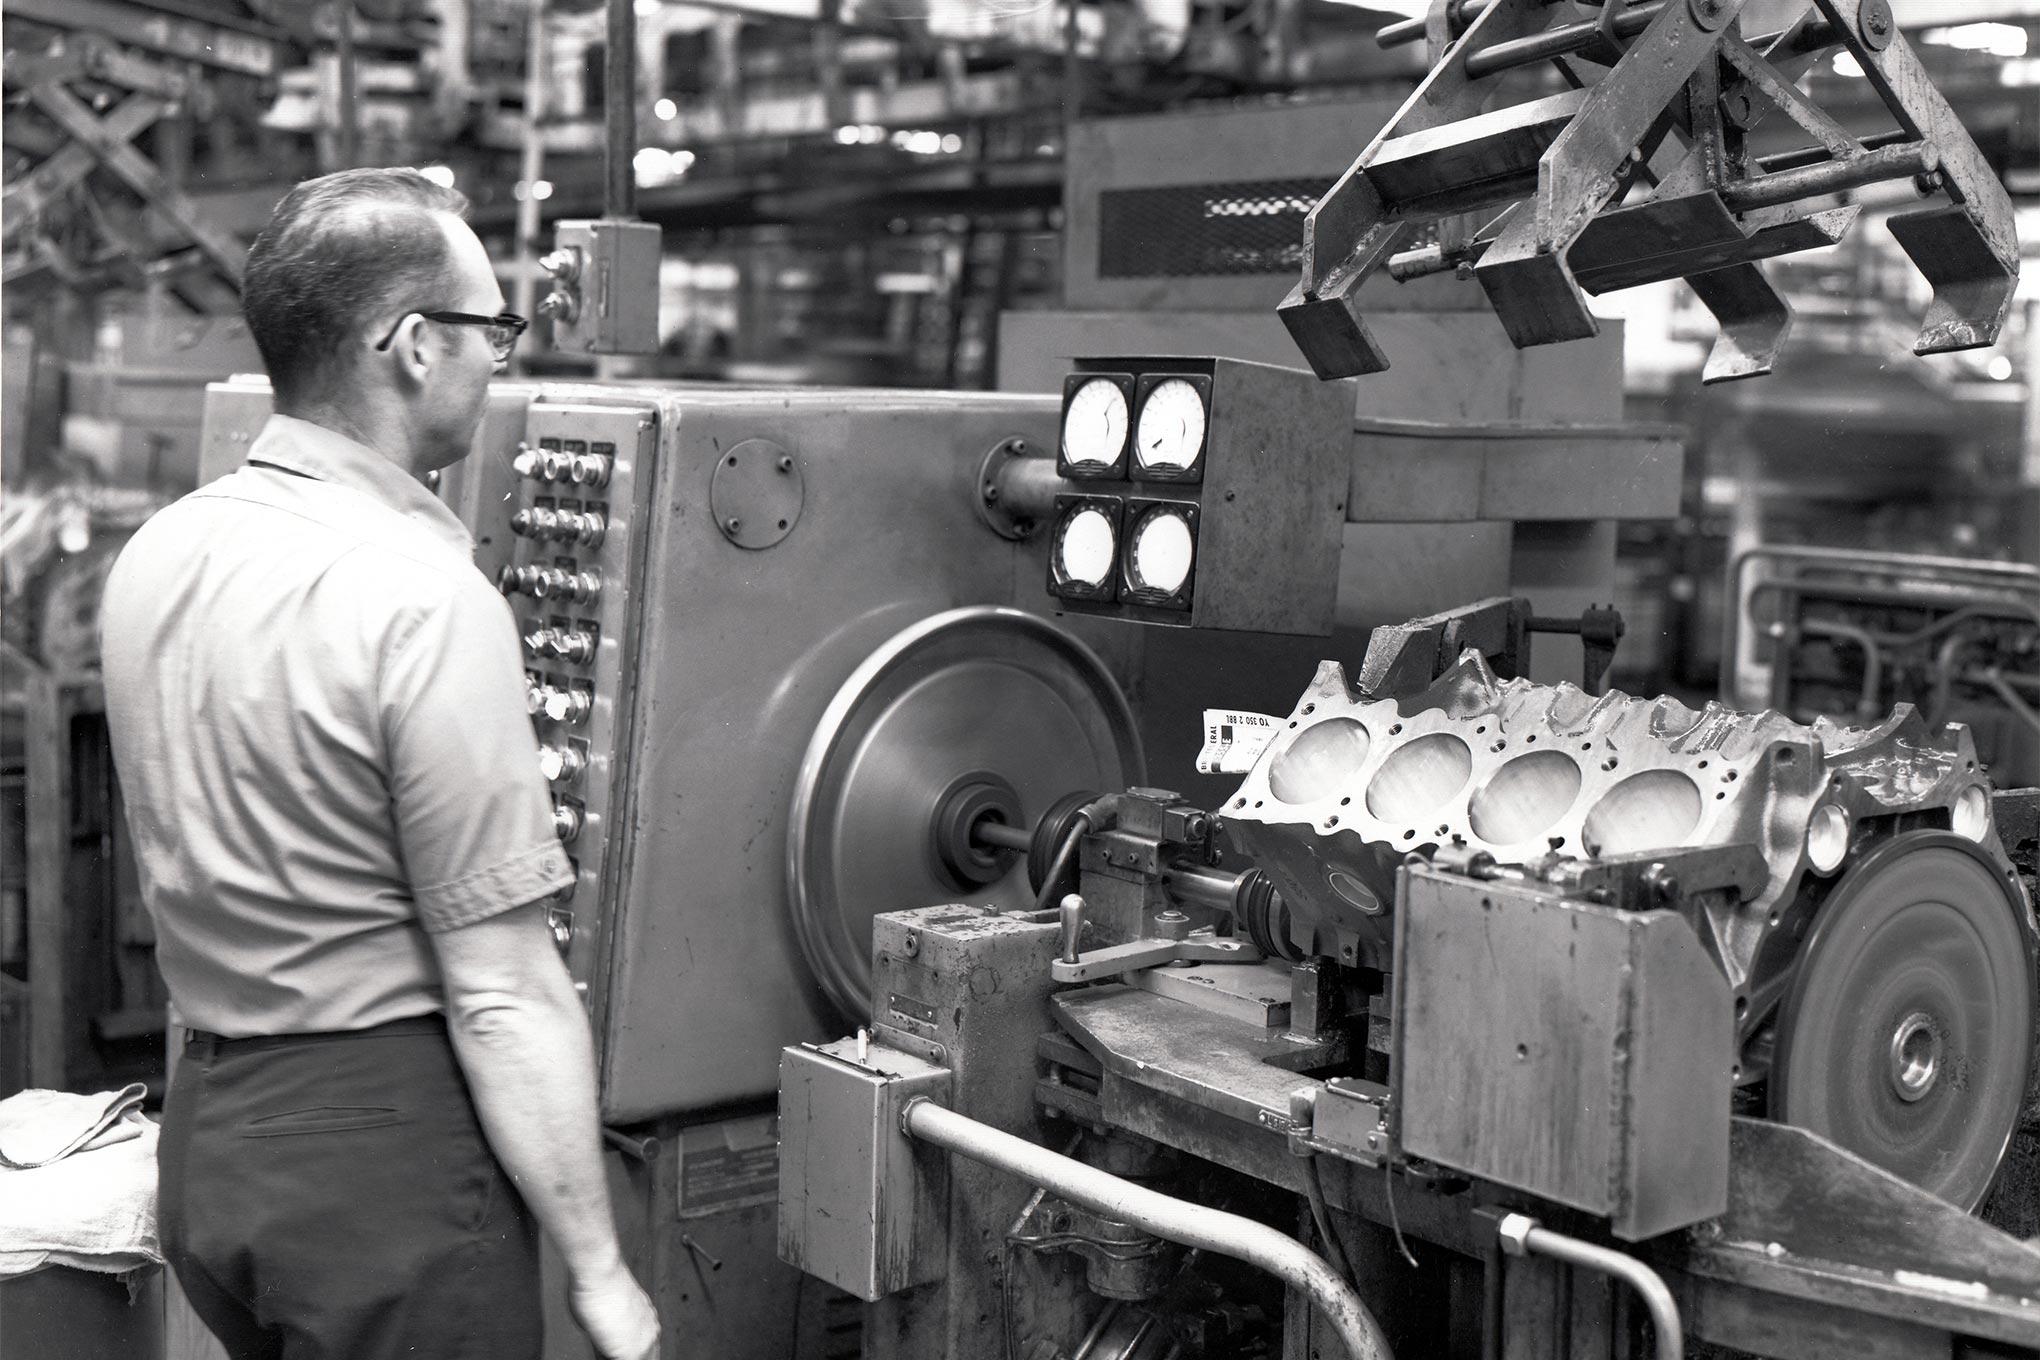 Blocks 1961 Pontiac Engine